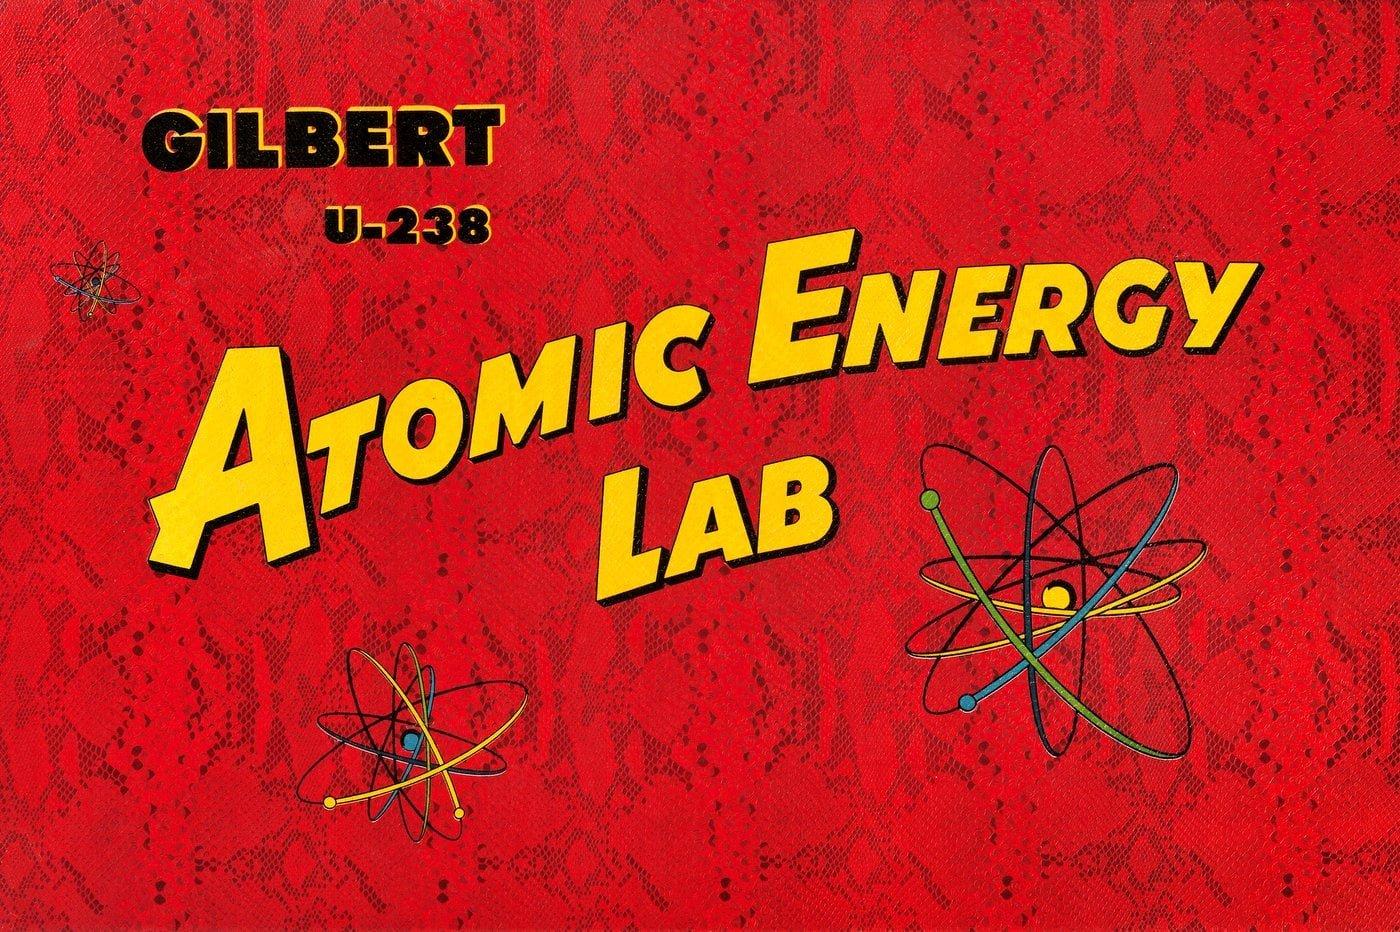 Gilbert U-238 Atomic Energy Lab